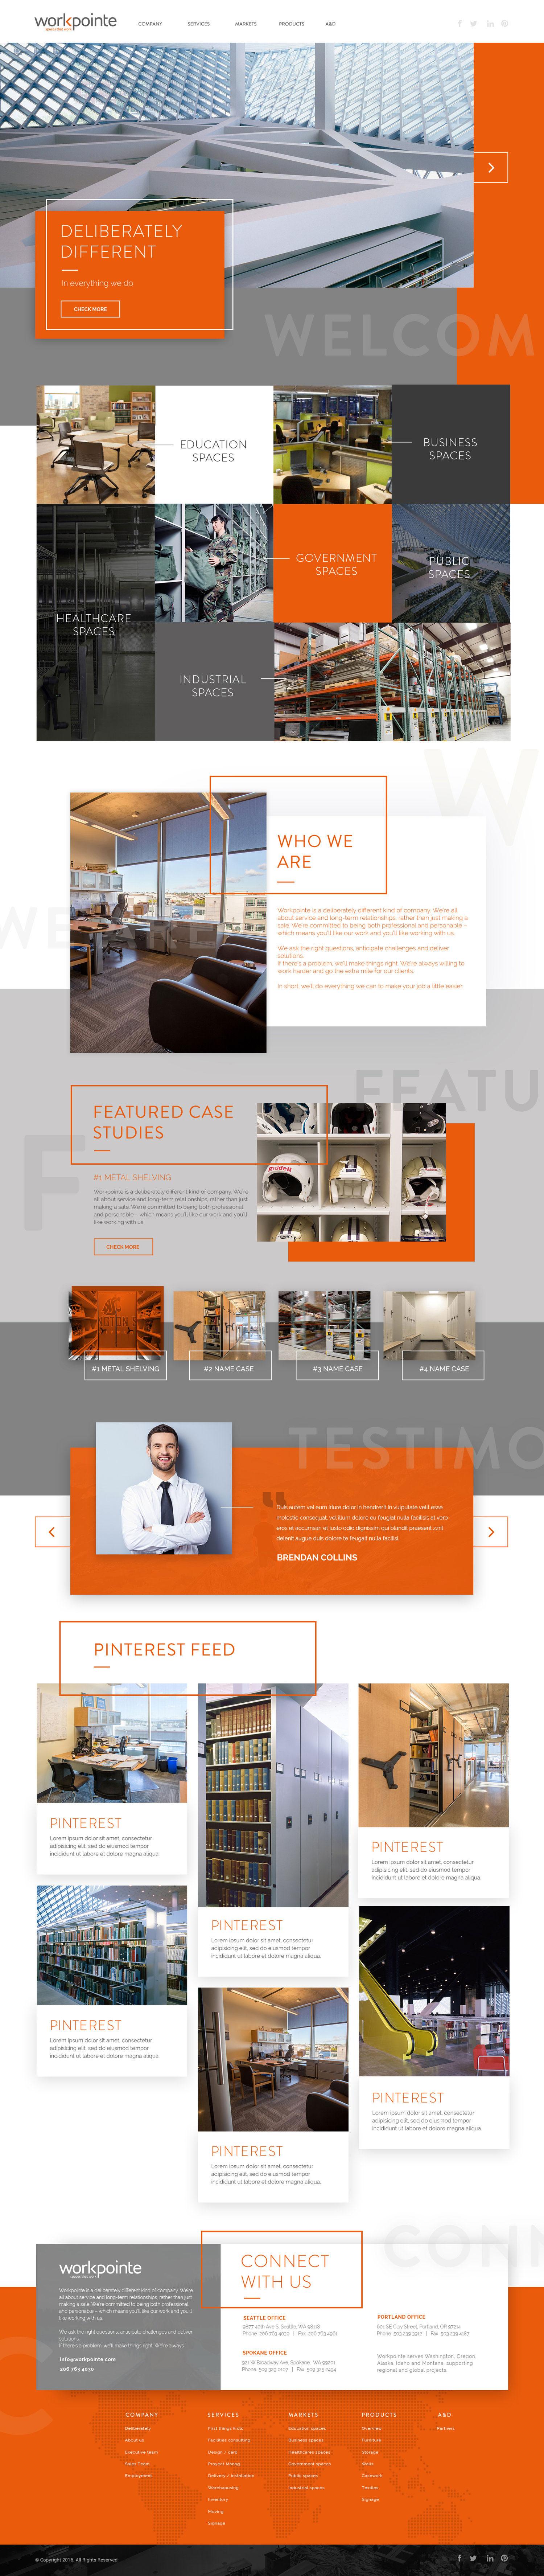 Web Design | Workpointe - Homepage | V3 (Desktop View)